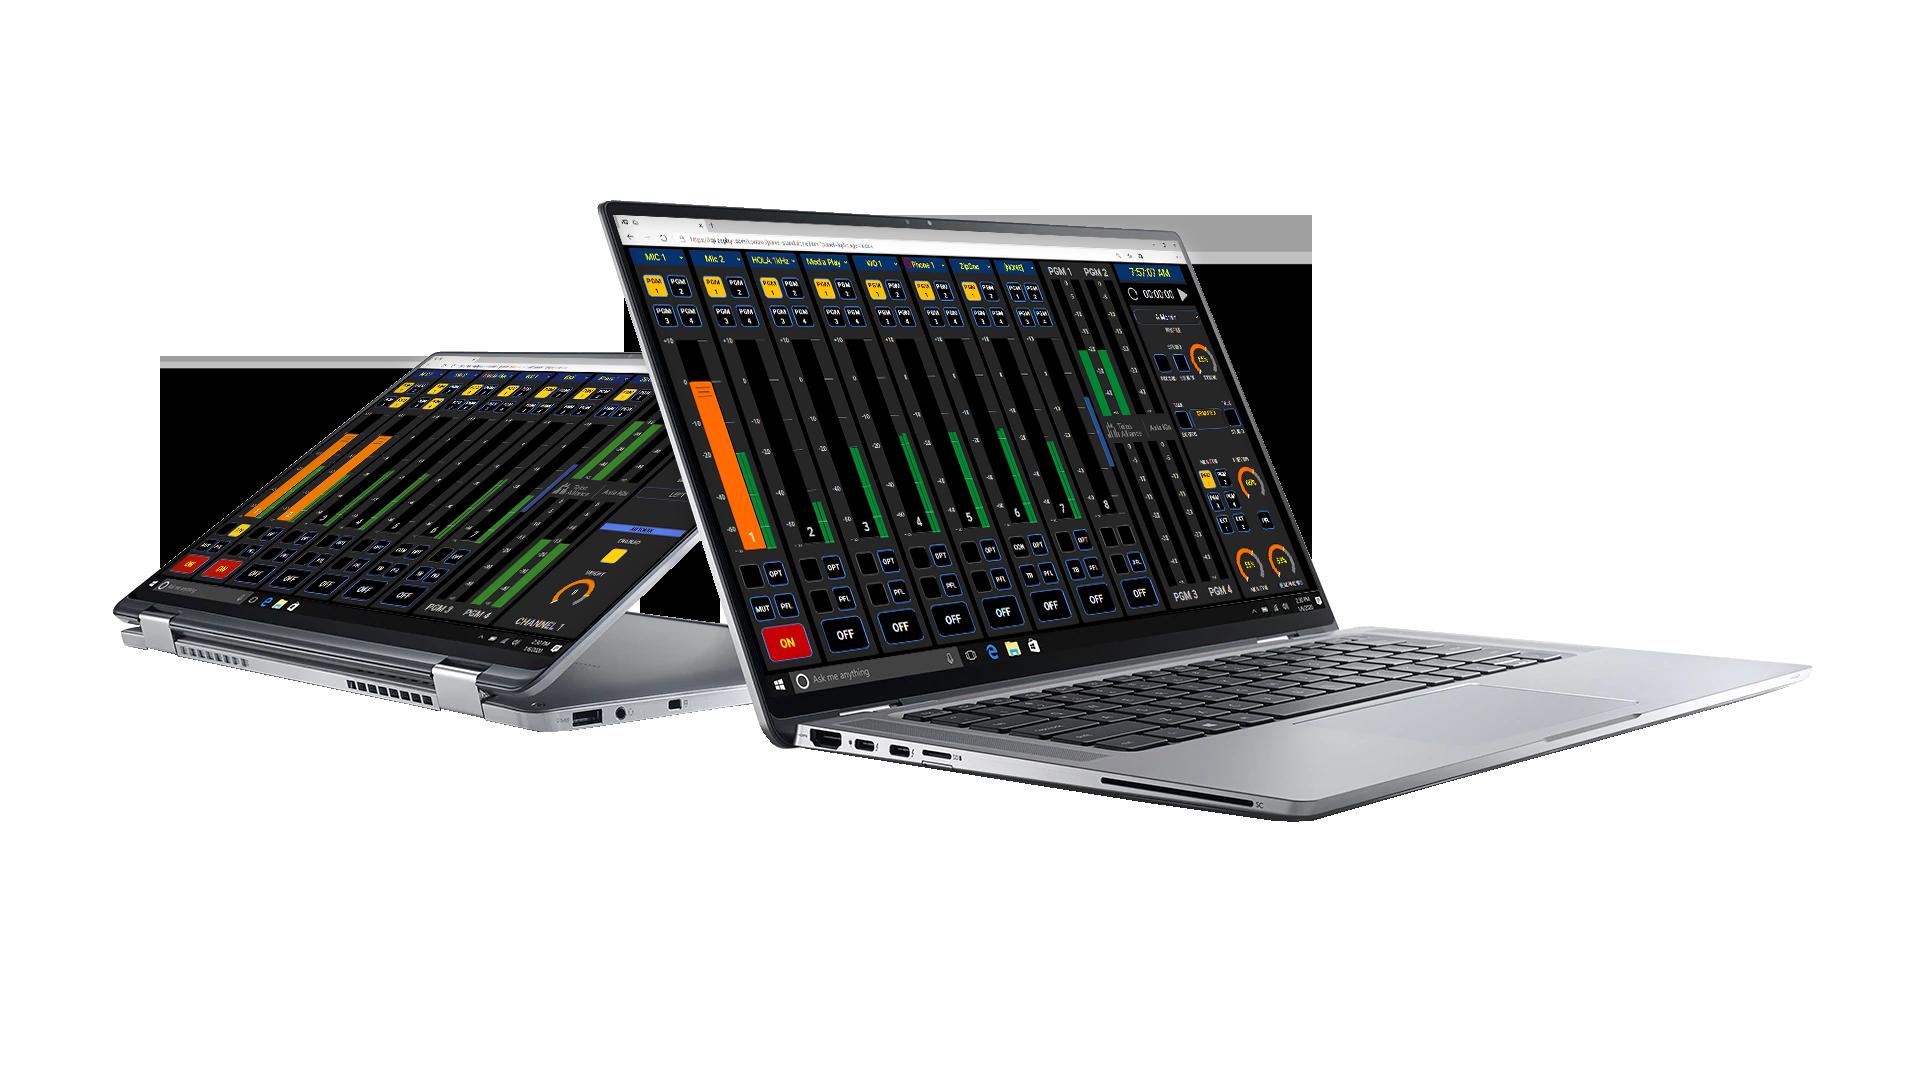 iQs laptop